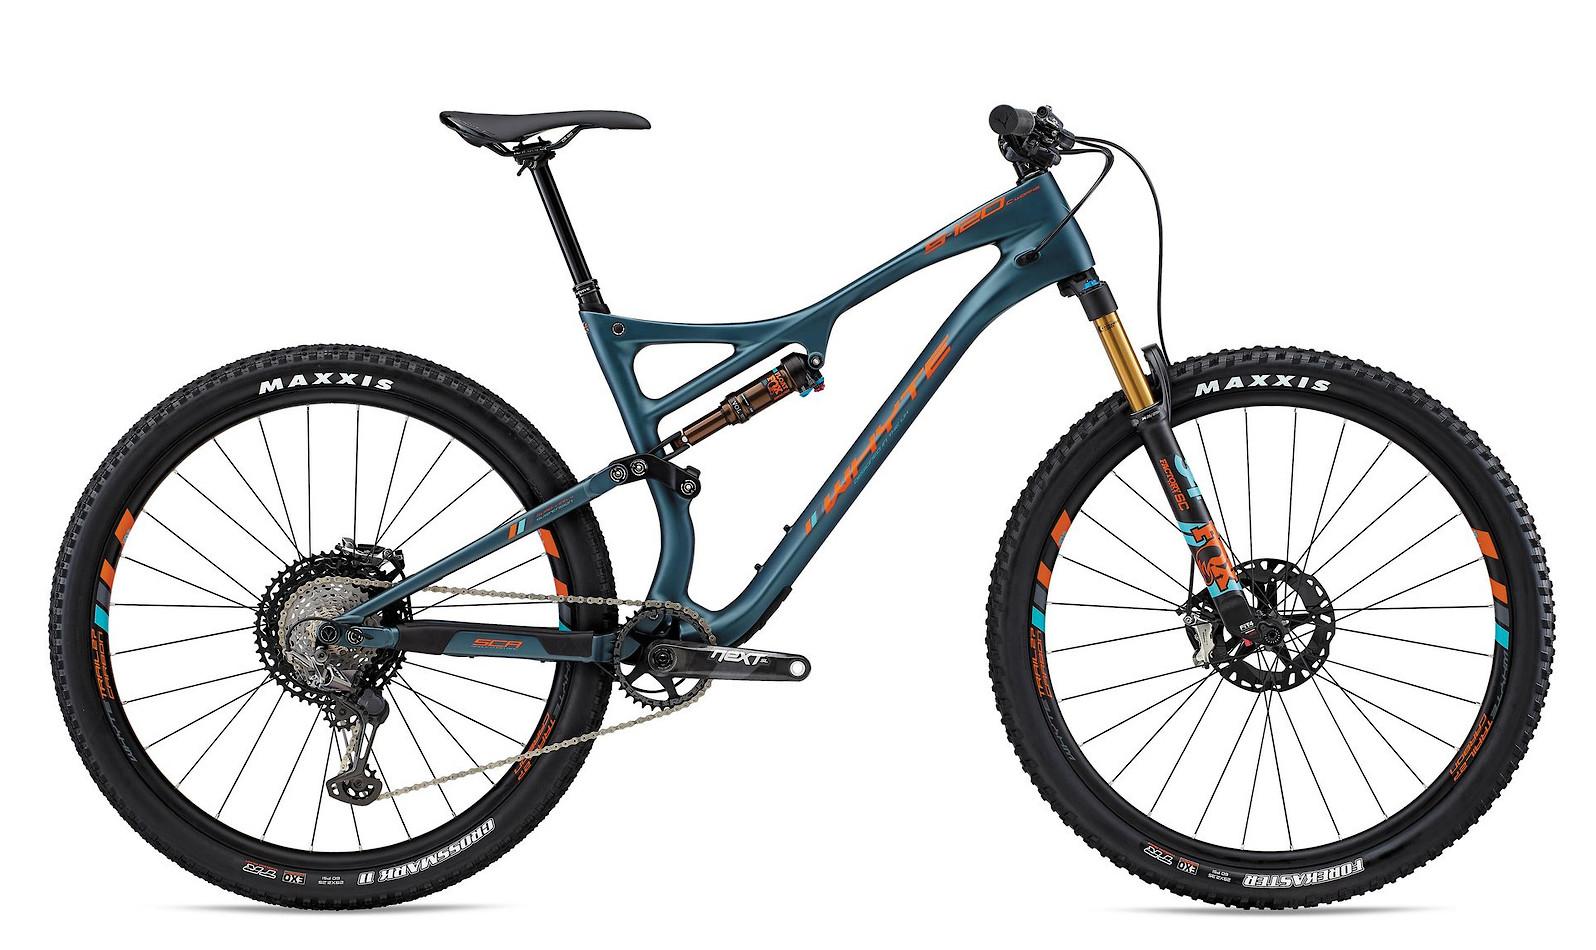 2019 Whyte S-120C Works Bike